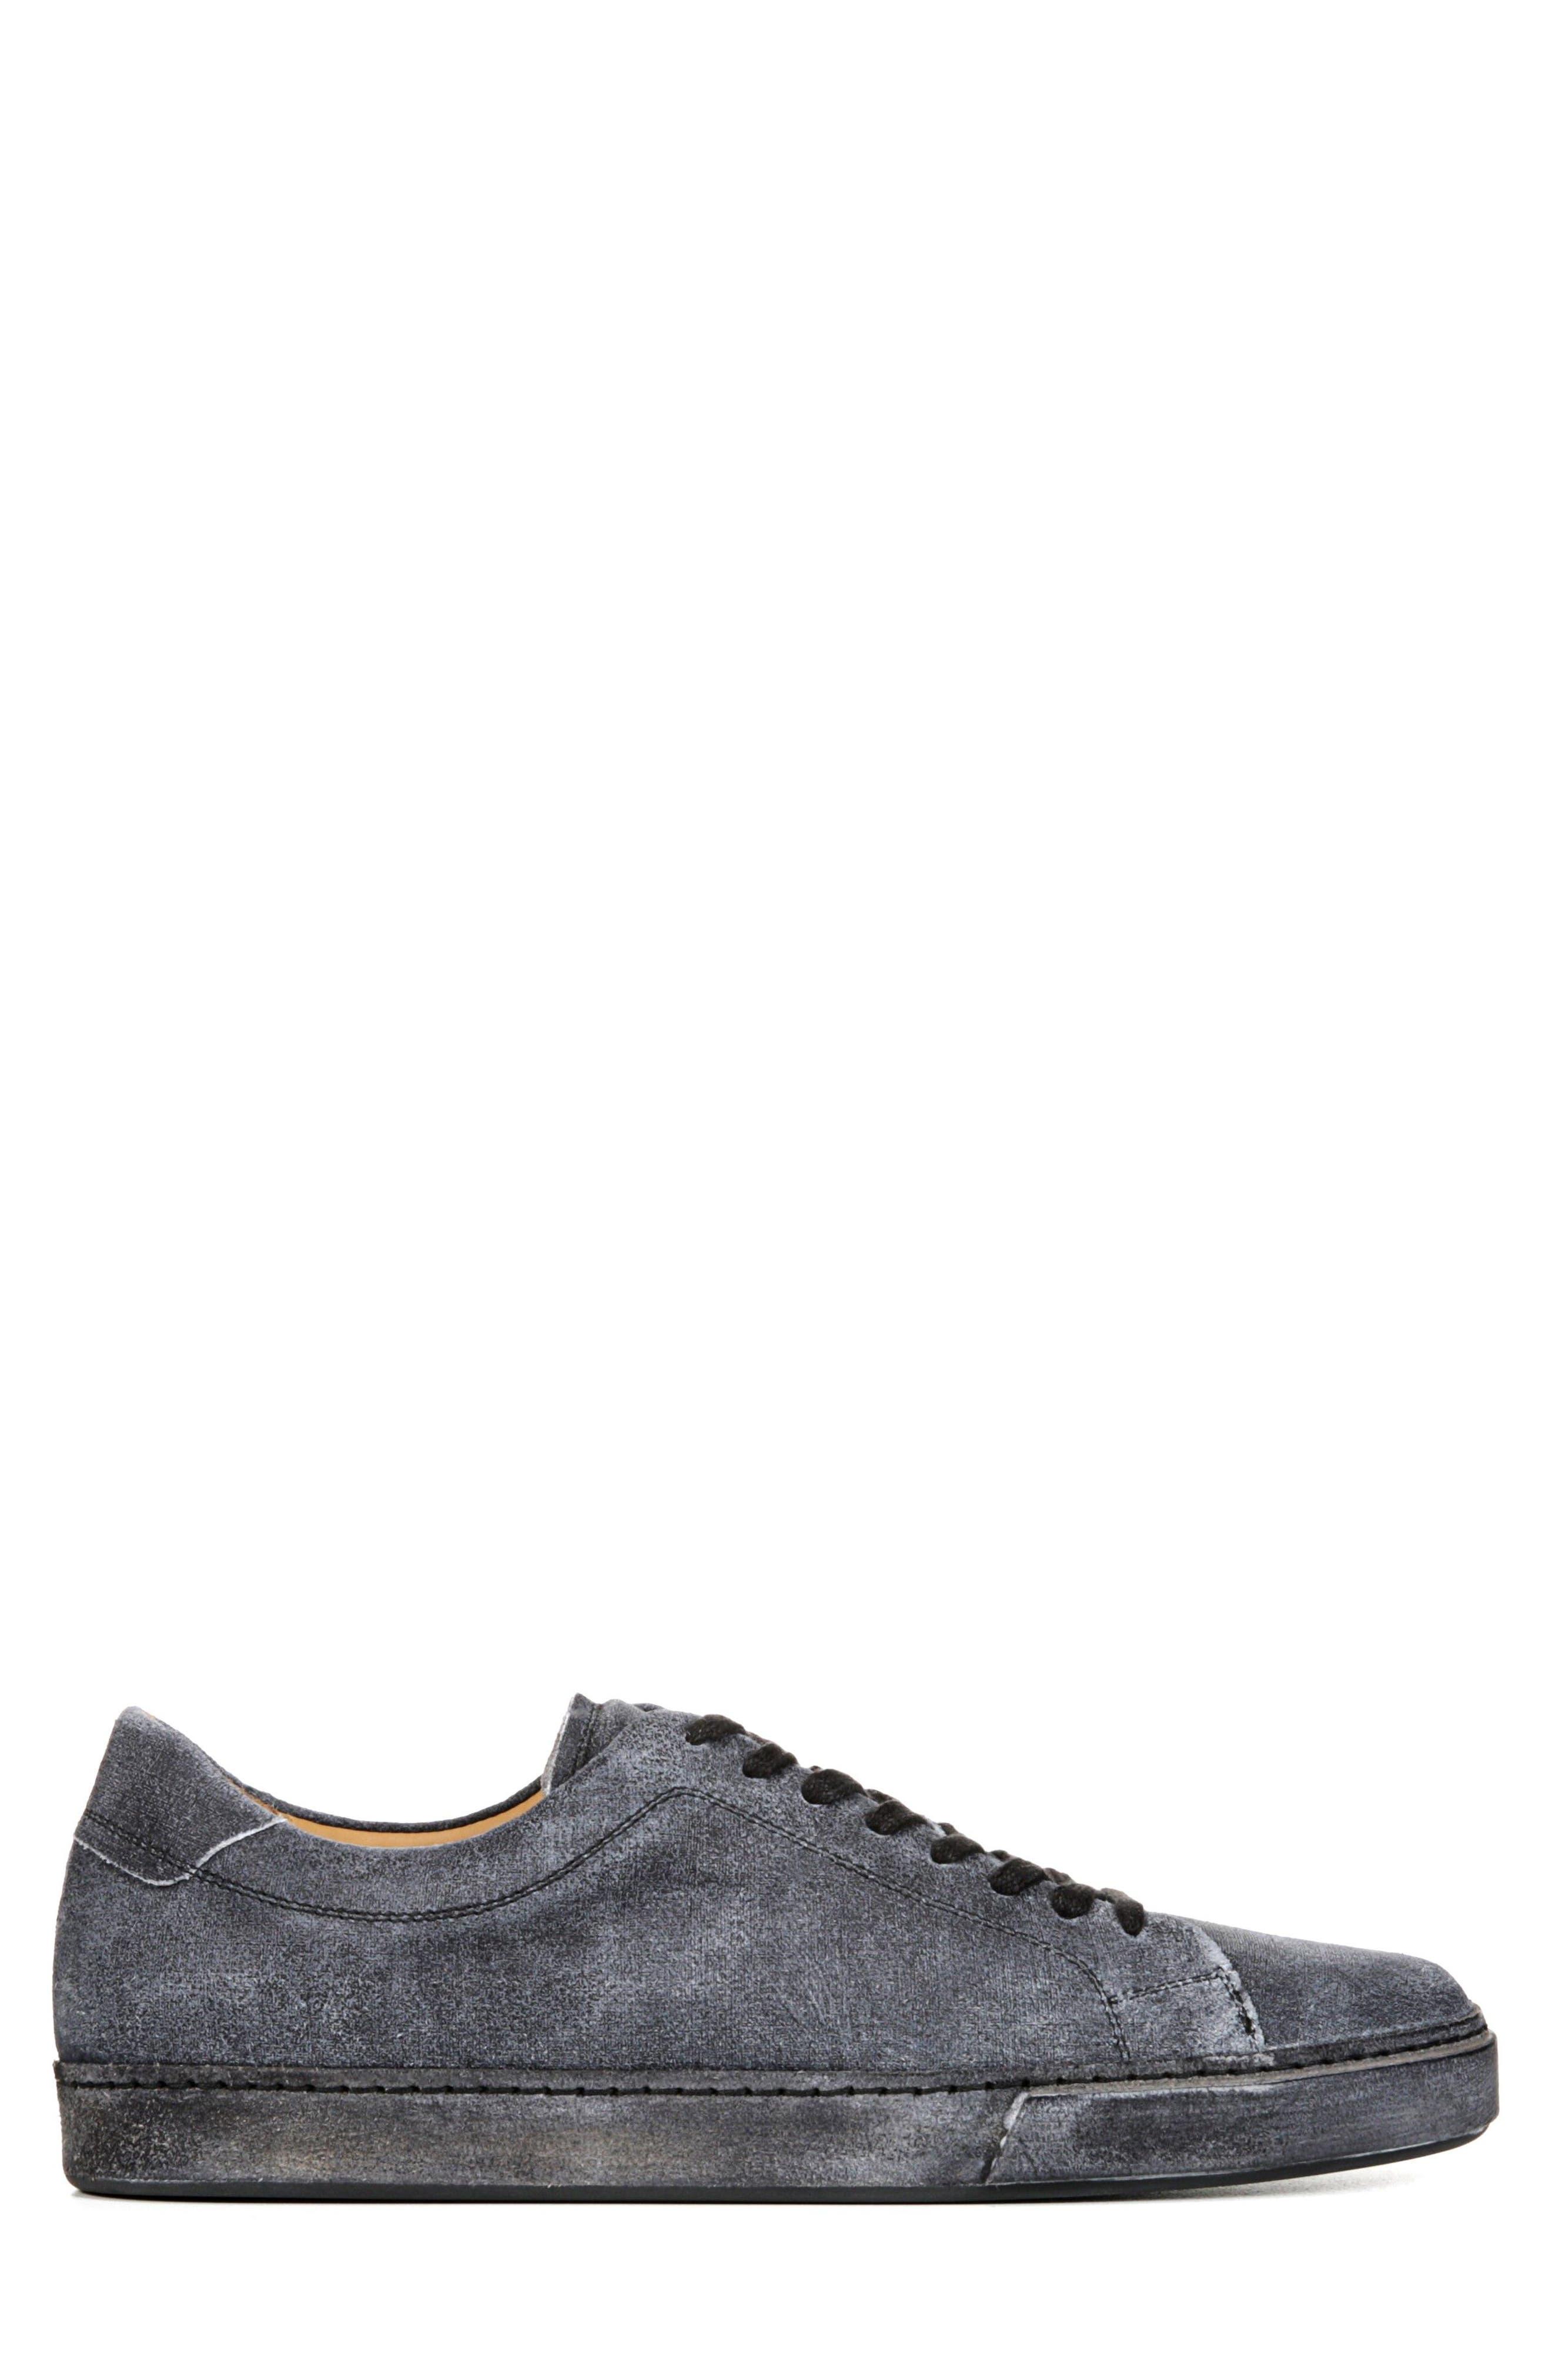 Nobel Sneaker,                             Alternate thumbnail 3, color,                             002